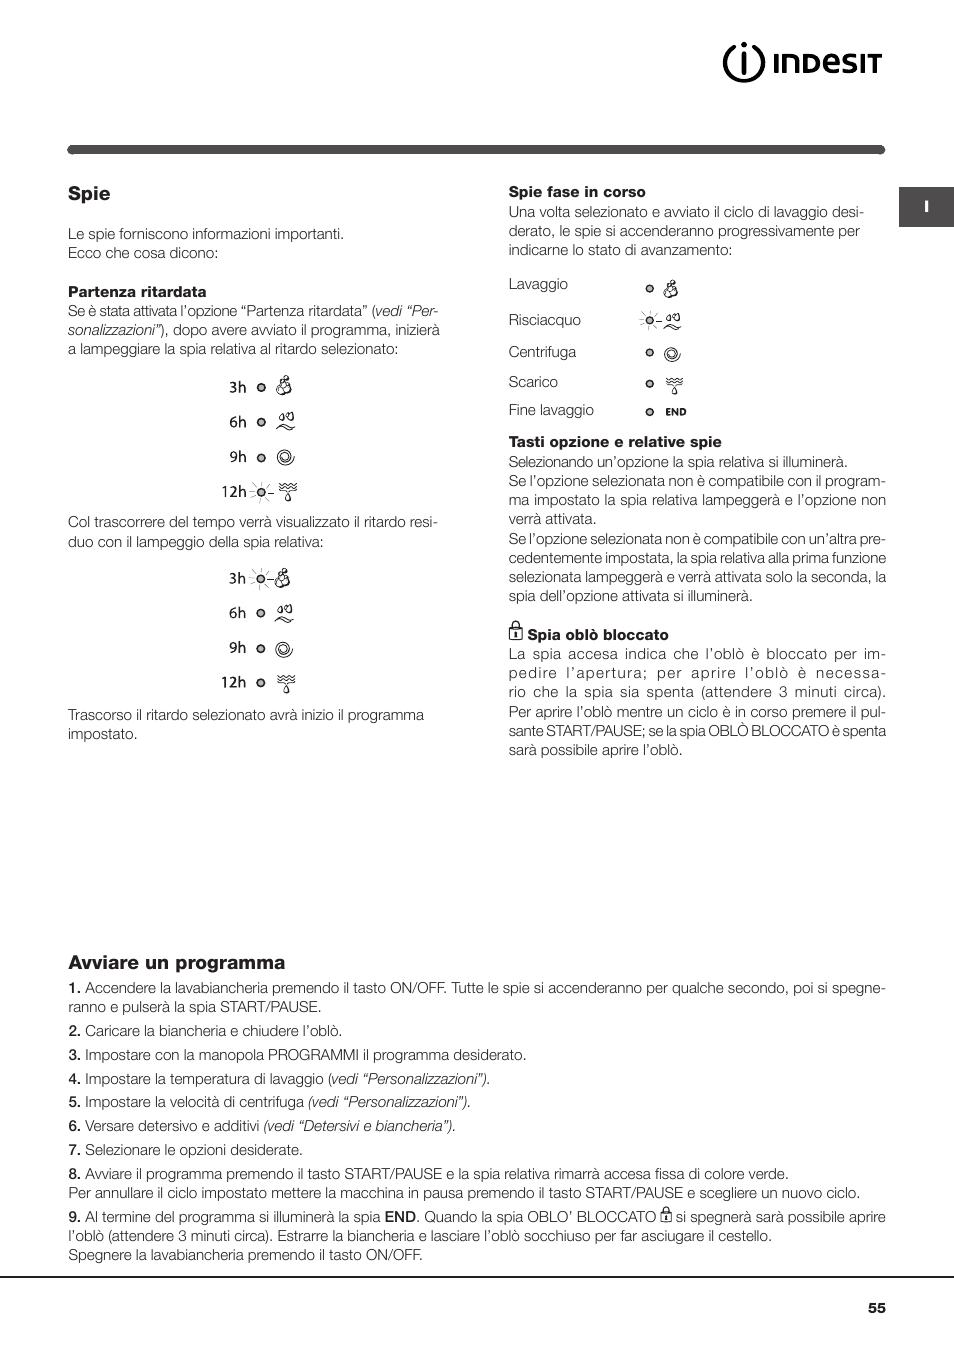 spie avviare un programma indesit iwc 61051 eu user manual page rh manualsdir com indesit iwc 61051 eu manual indesit iwc 61051 manuale italiano